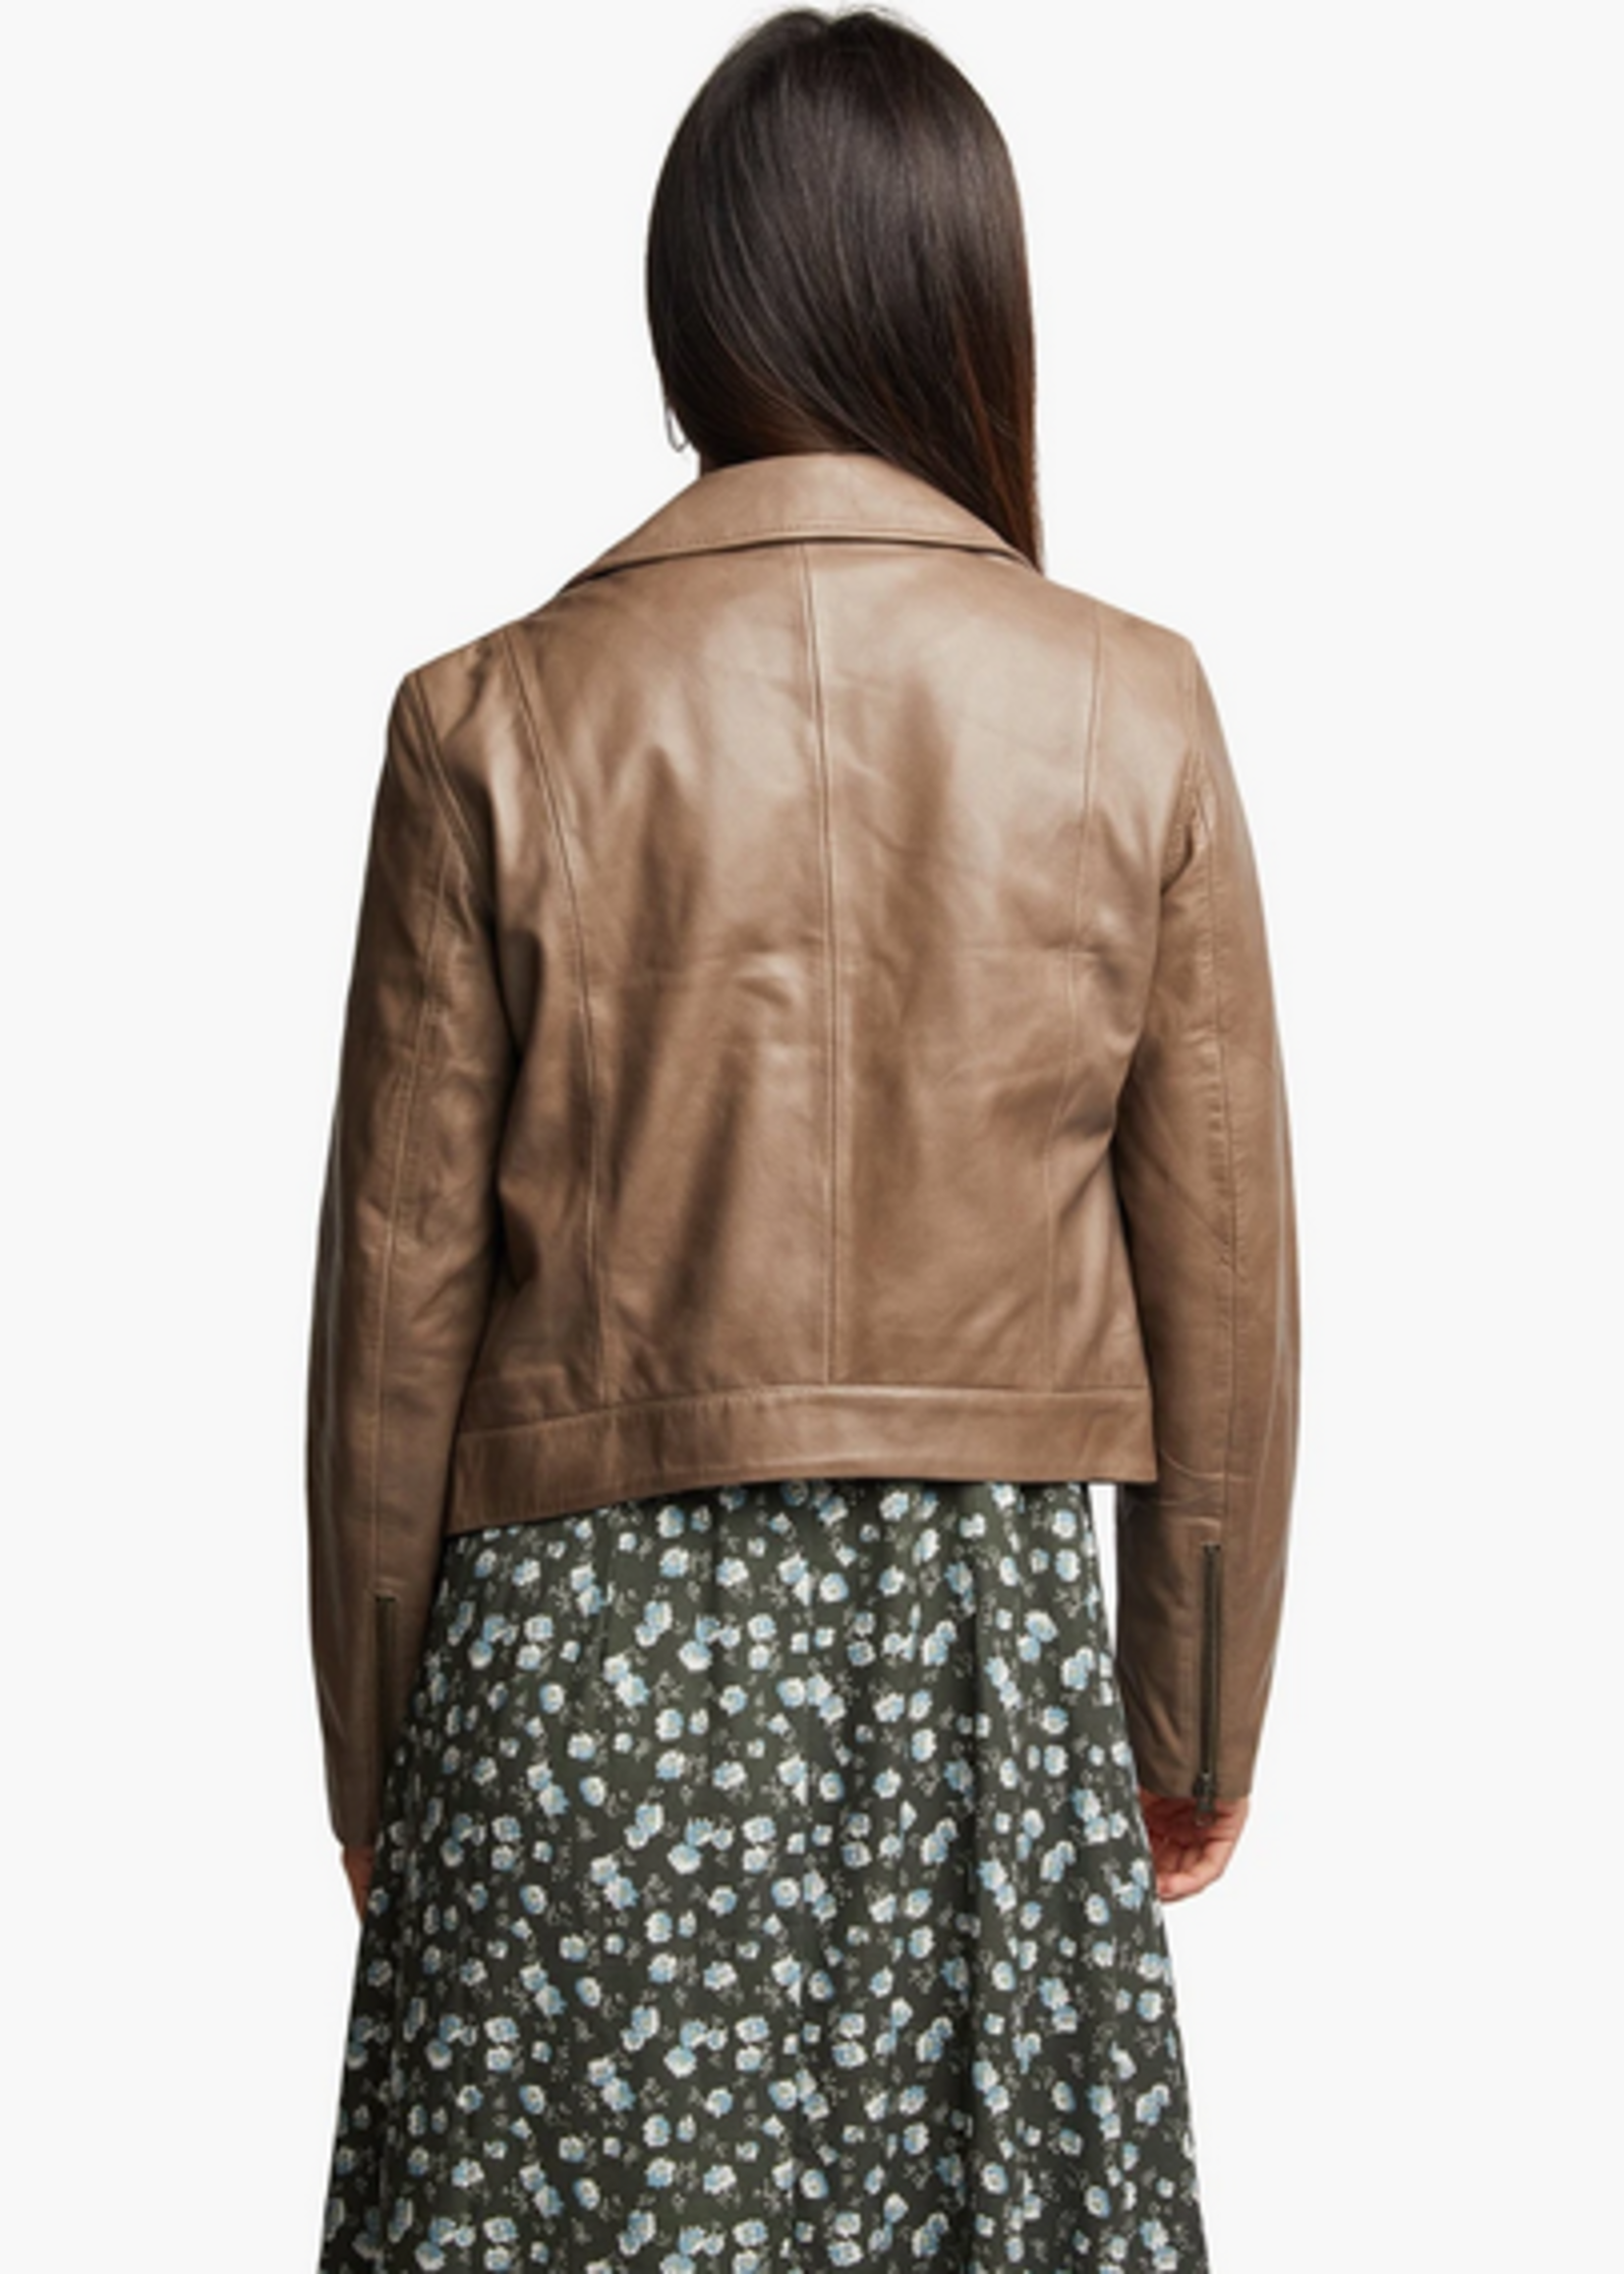 Elitaire Boutique Maha Slate Leather Jacket